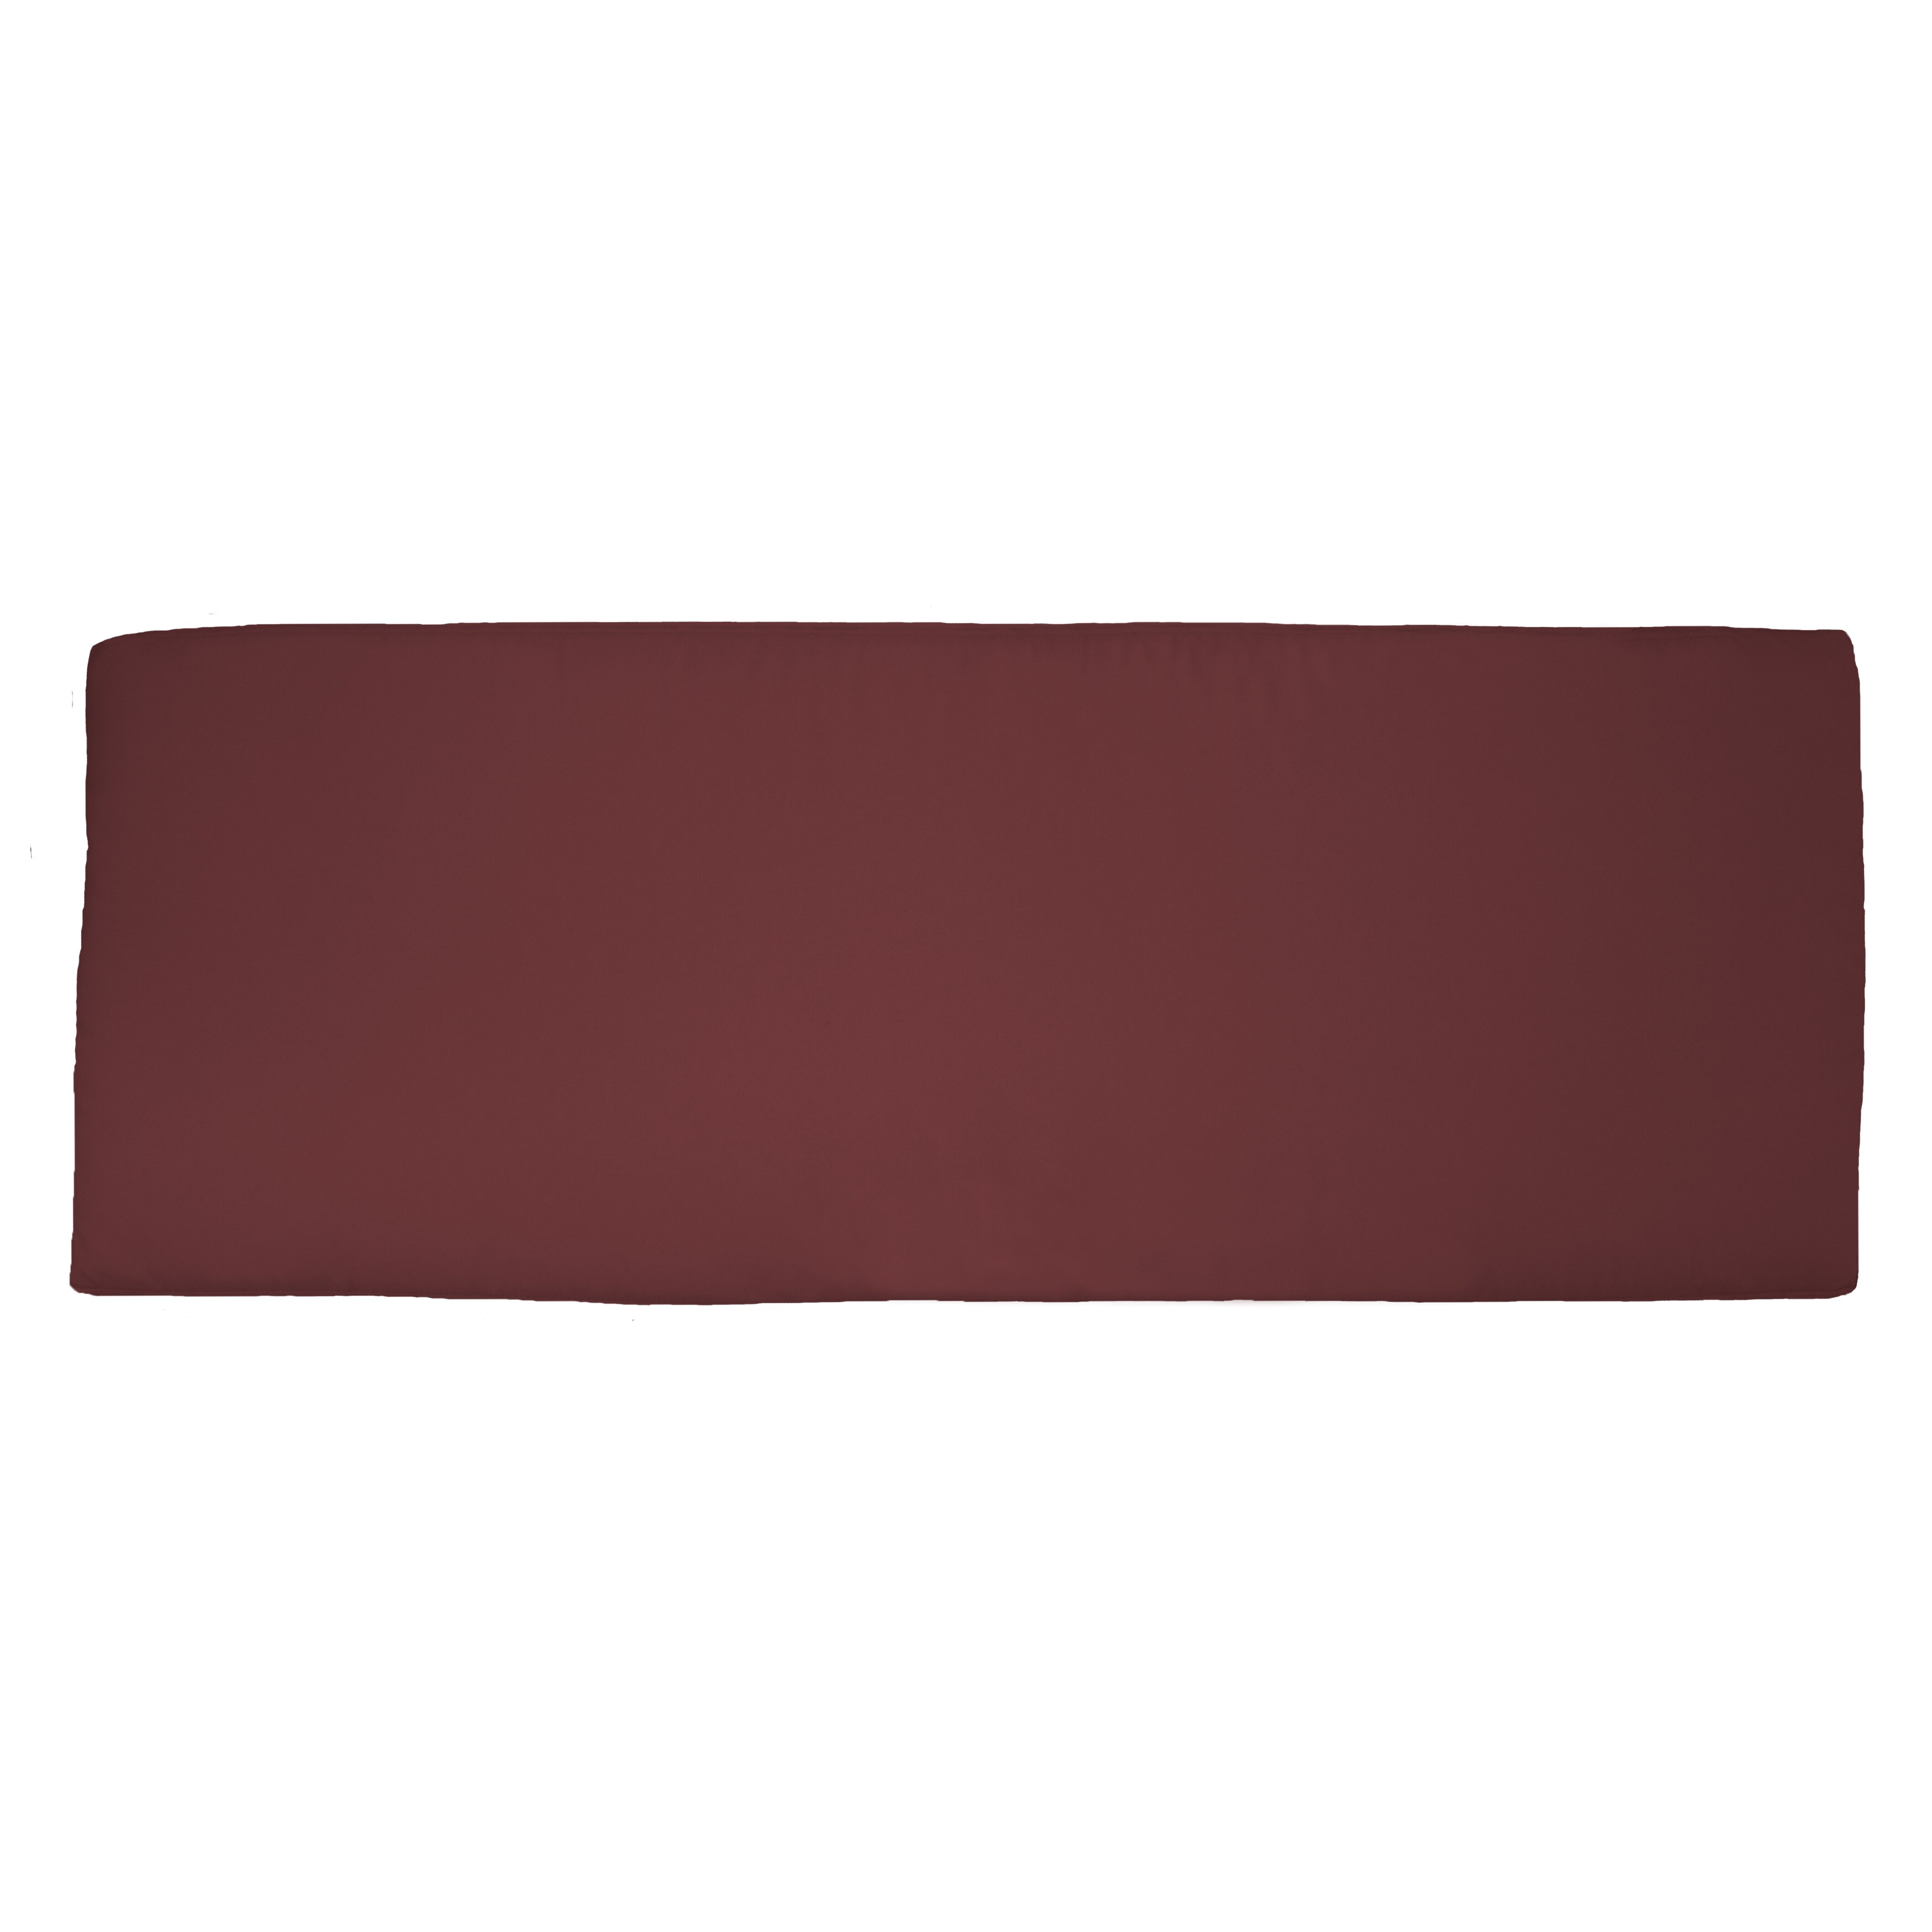 Wayfair Custom Outdoor Cushions Knife Edge Outdoor Bench